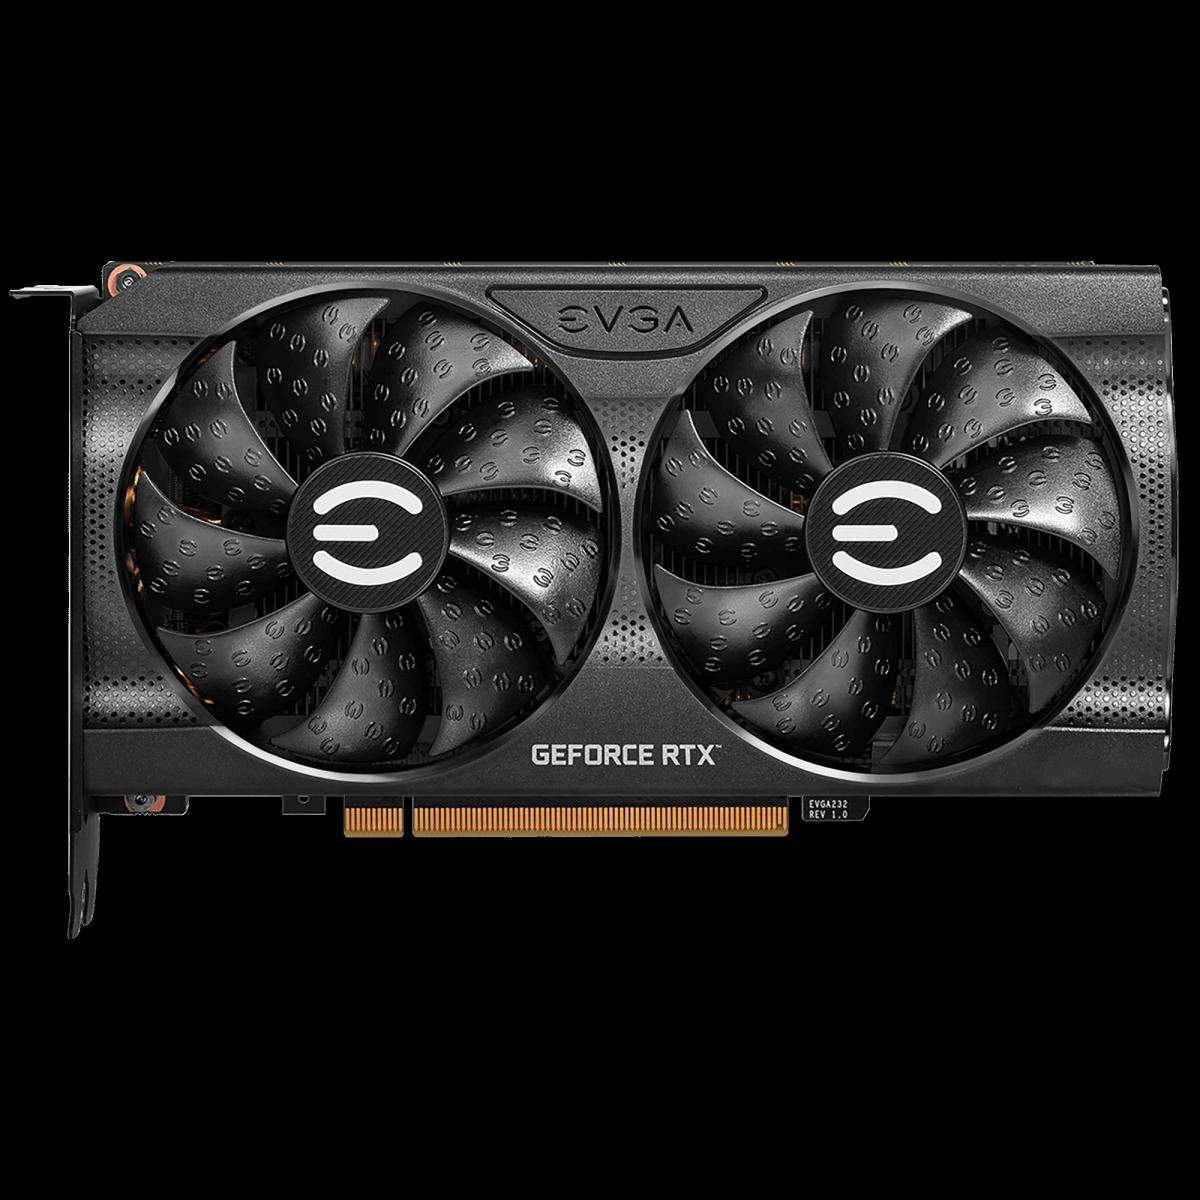 Placa de Vídeo EVGA GeForce RTX 3060 XC Gaming 12GB GDDR6 192bit 12G-P5-3657-KR